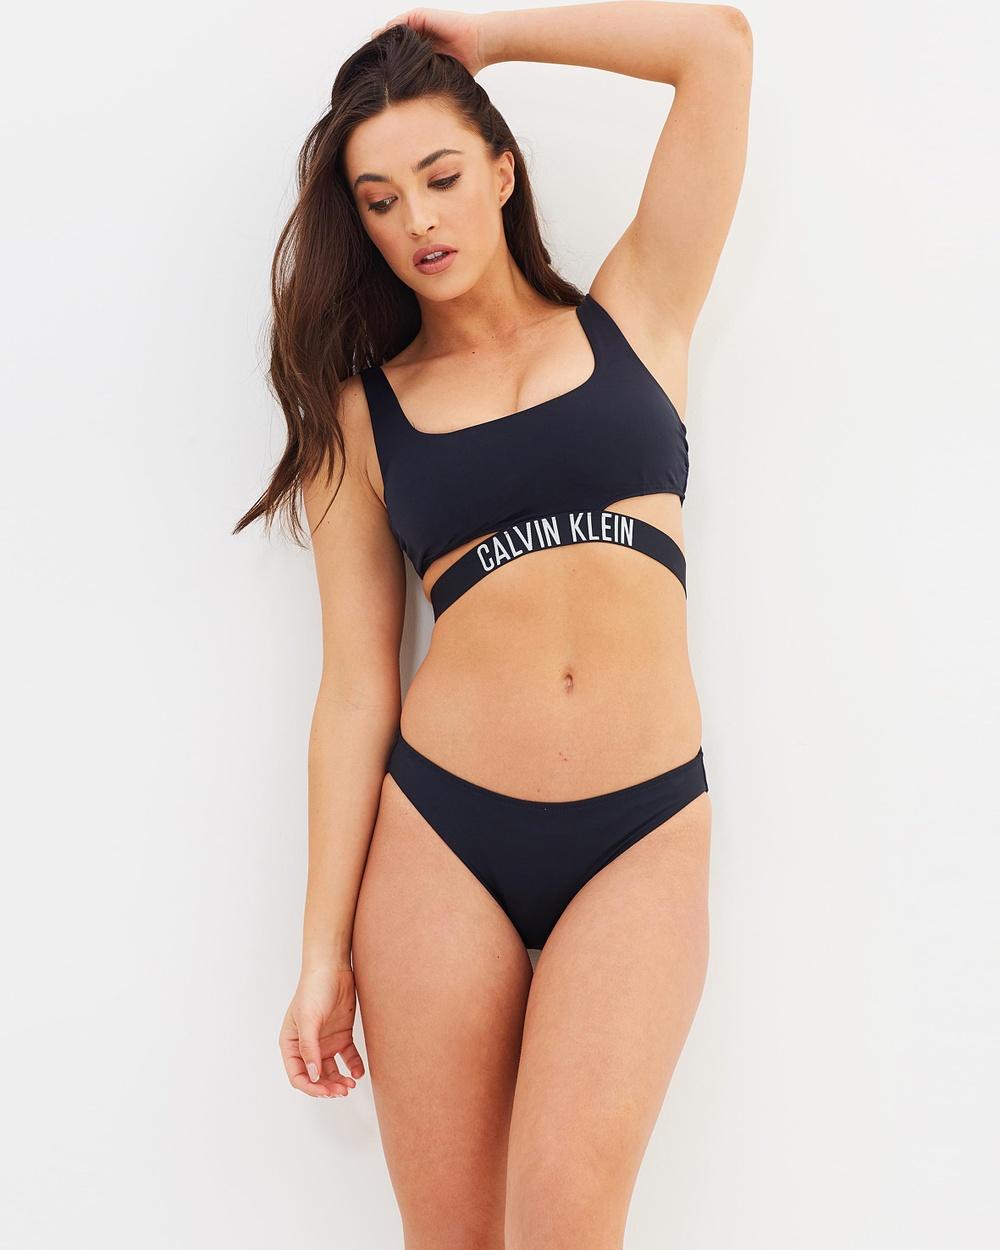 CK Swim Classic Clean Bikini Bottoms Bikini Bottoms Black Classic Clean Bikini Bottoms